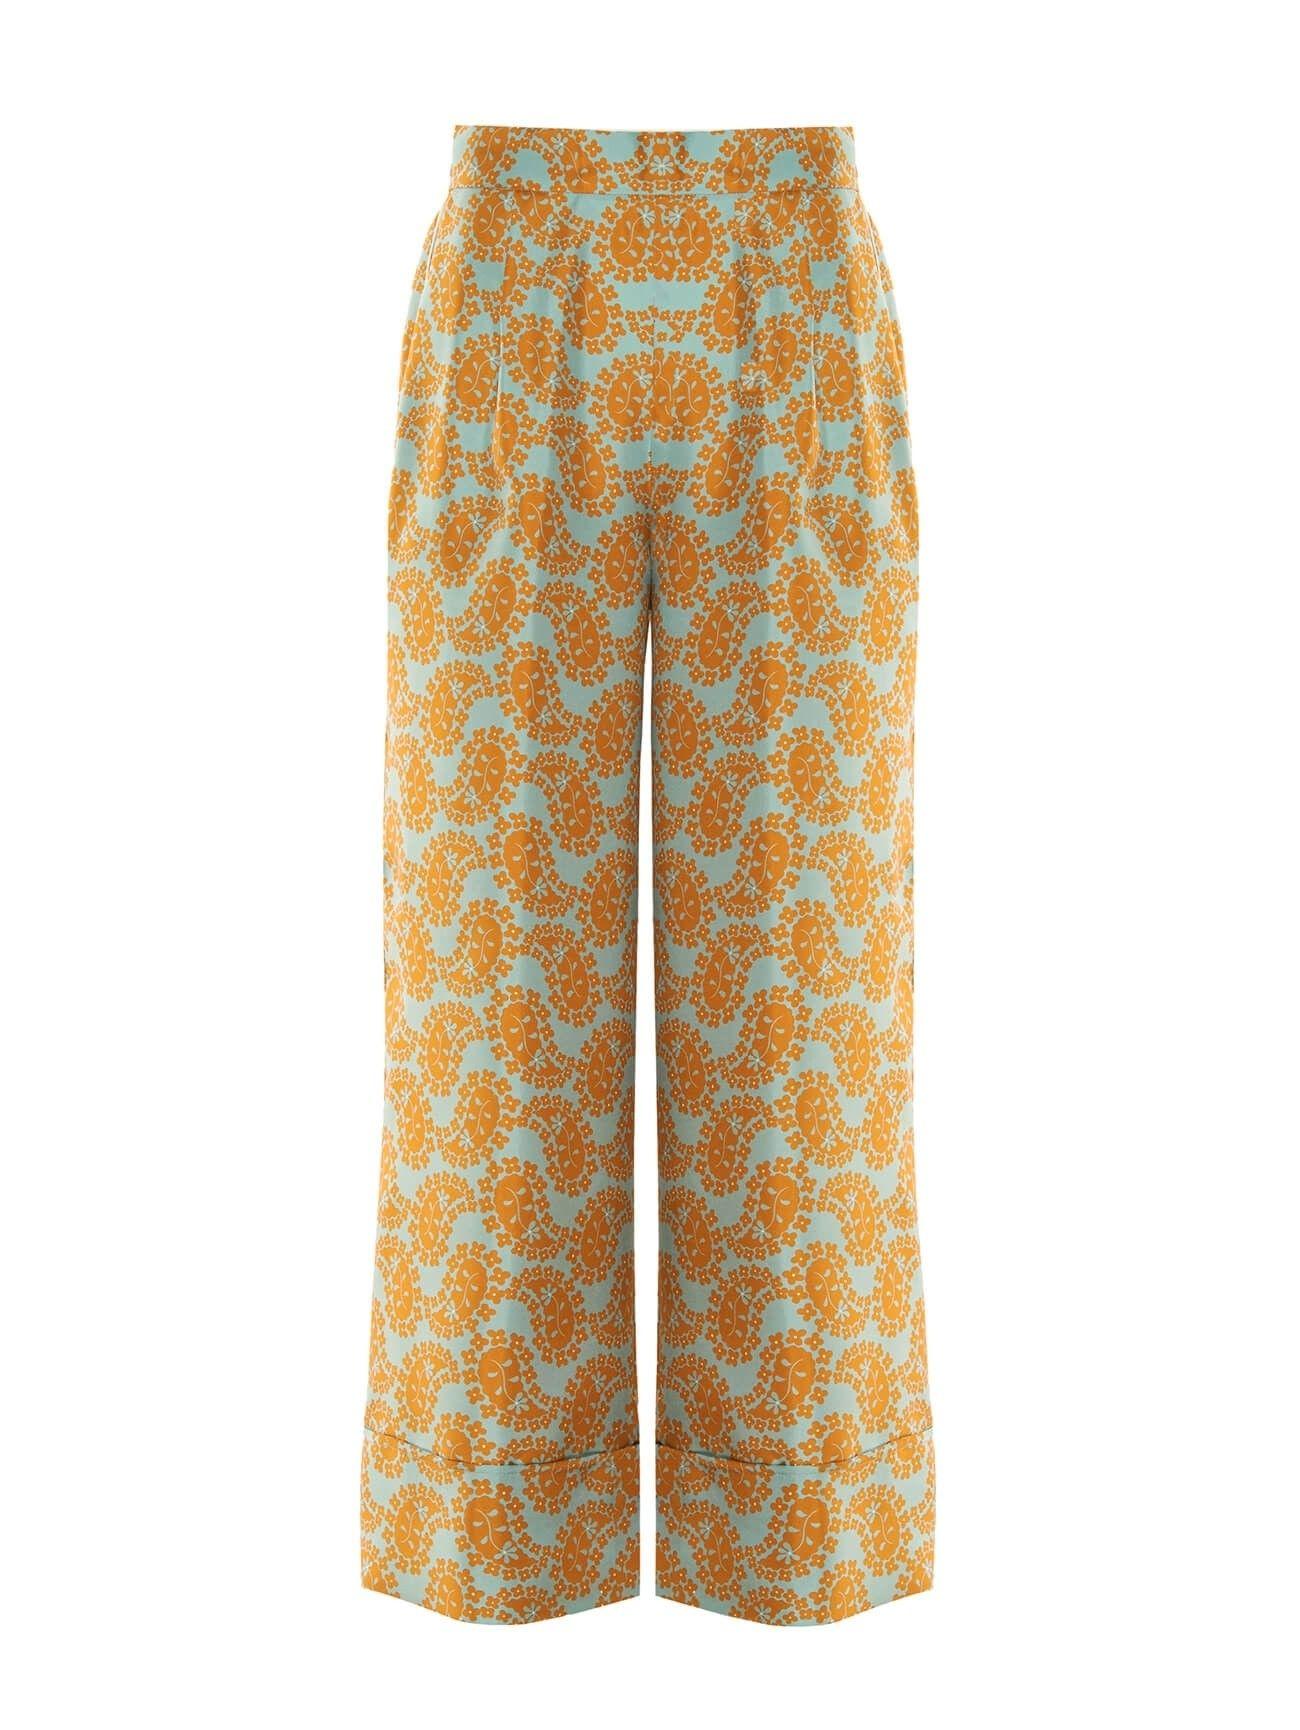 BEATRICE.B - Damen Hose - Cropped Pants - Seide - Blau / Orange